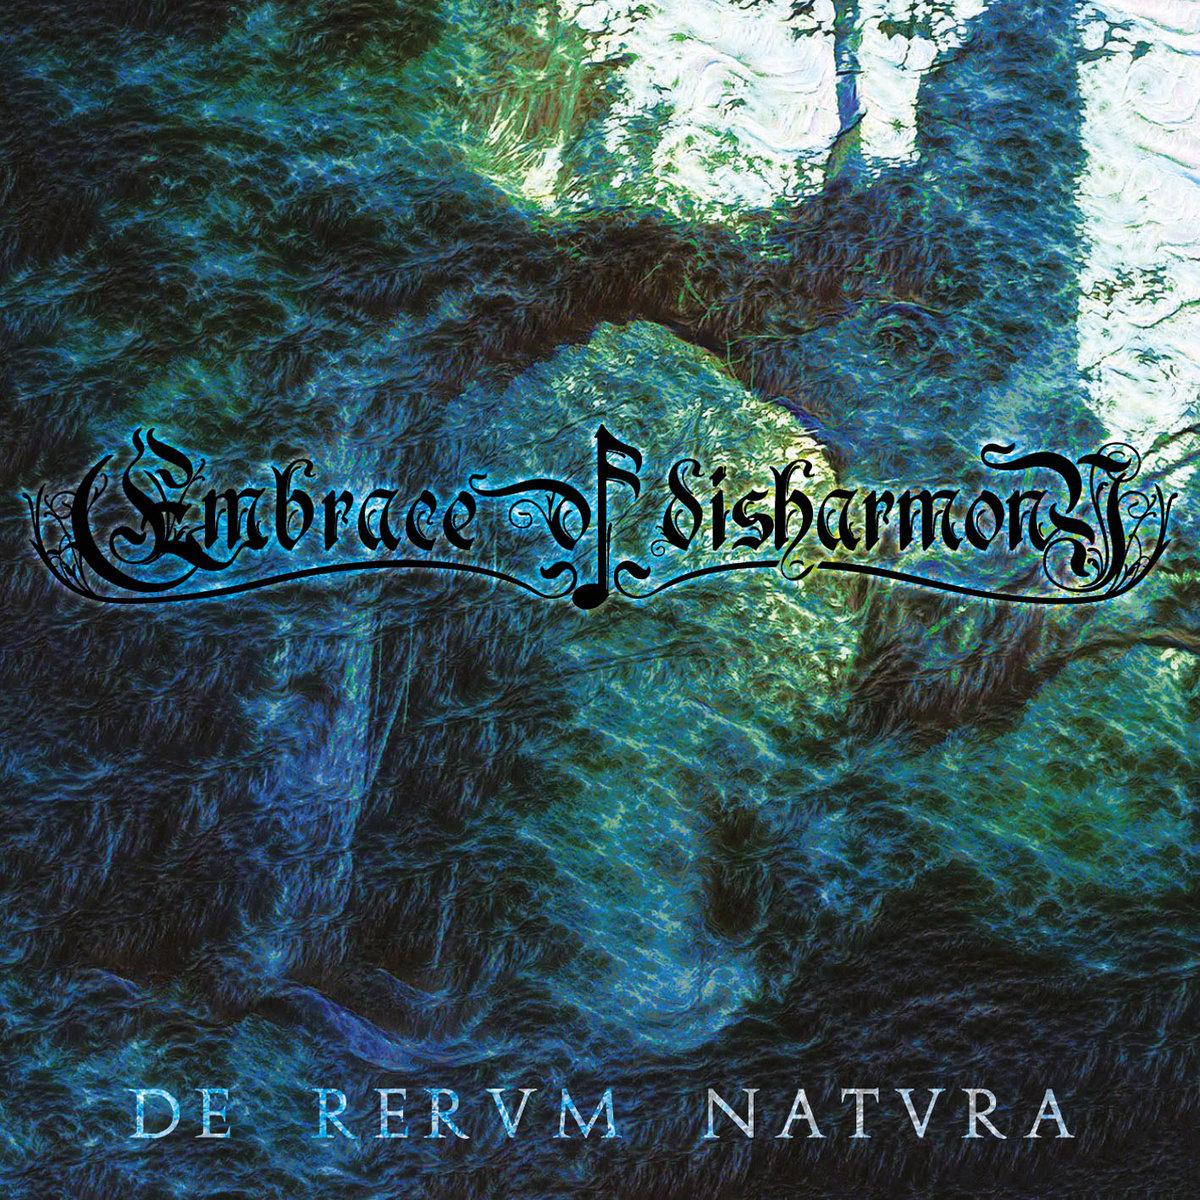 Embrace of Disharmony: De Rervm Natvra